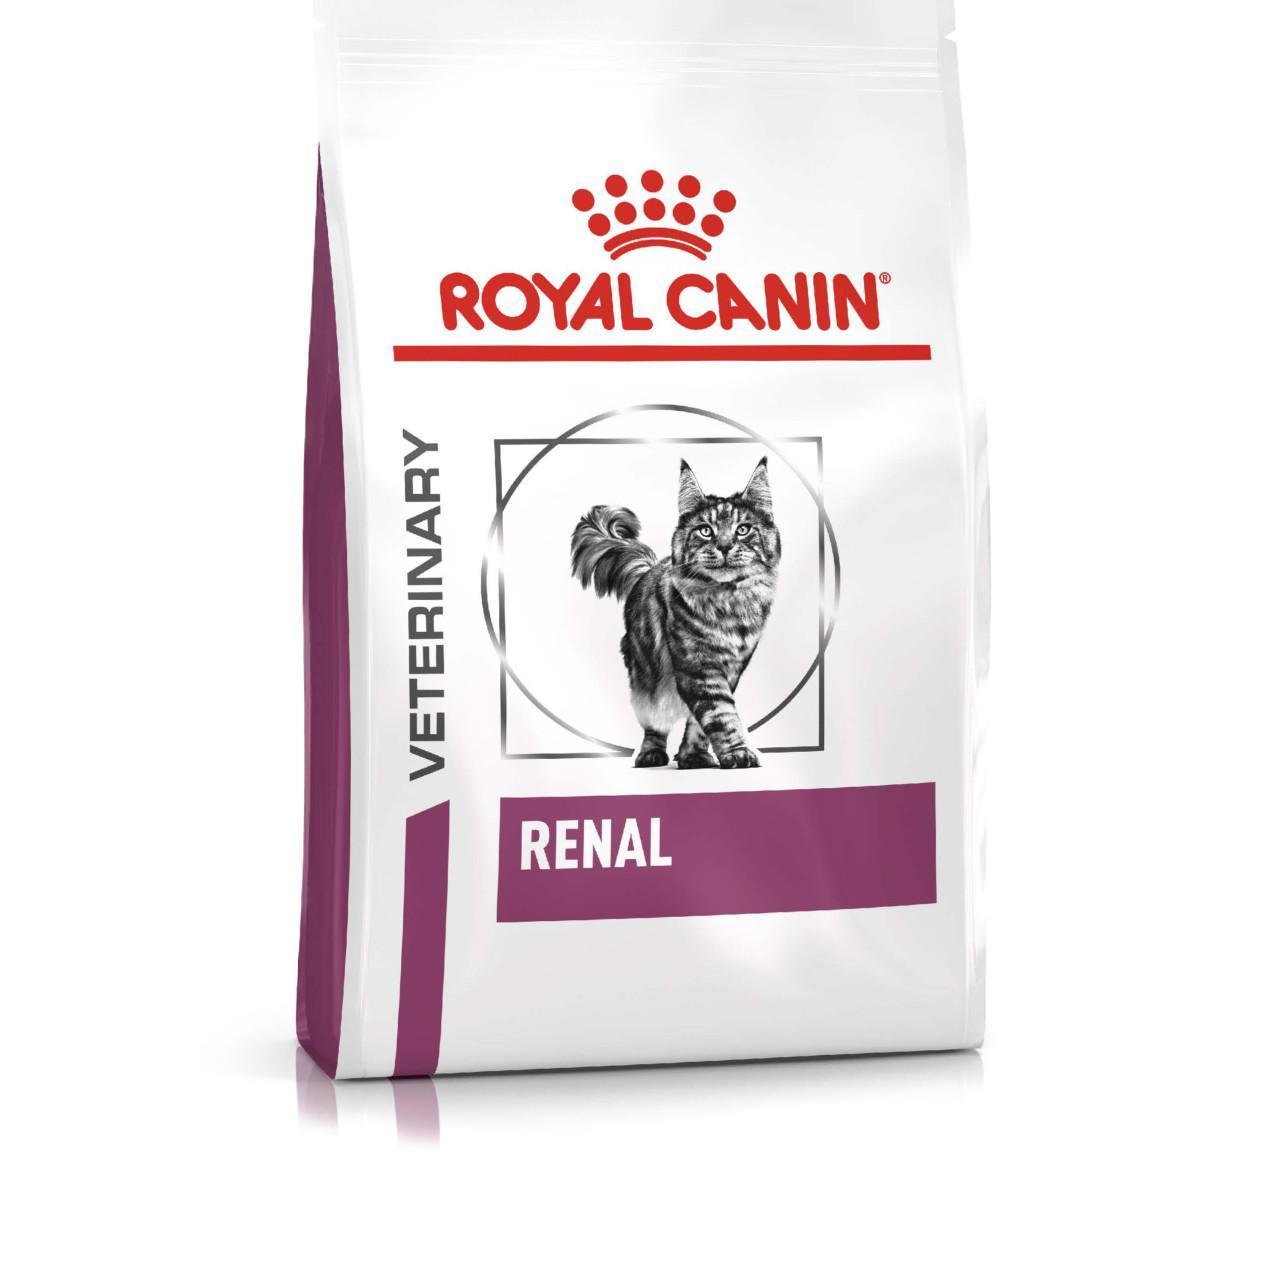 An image of Royal Canin Feline Renal